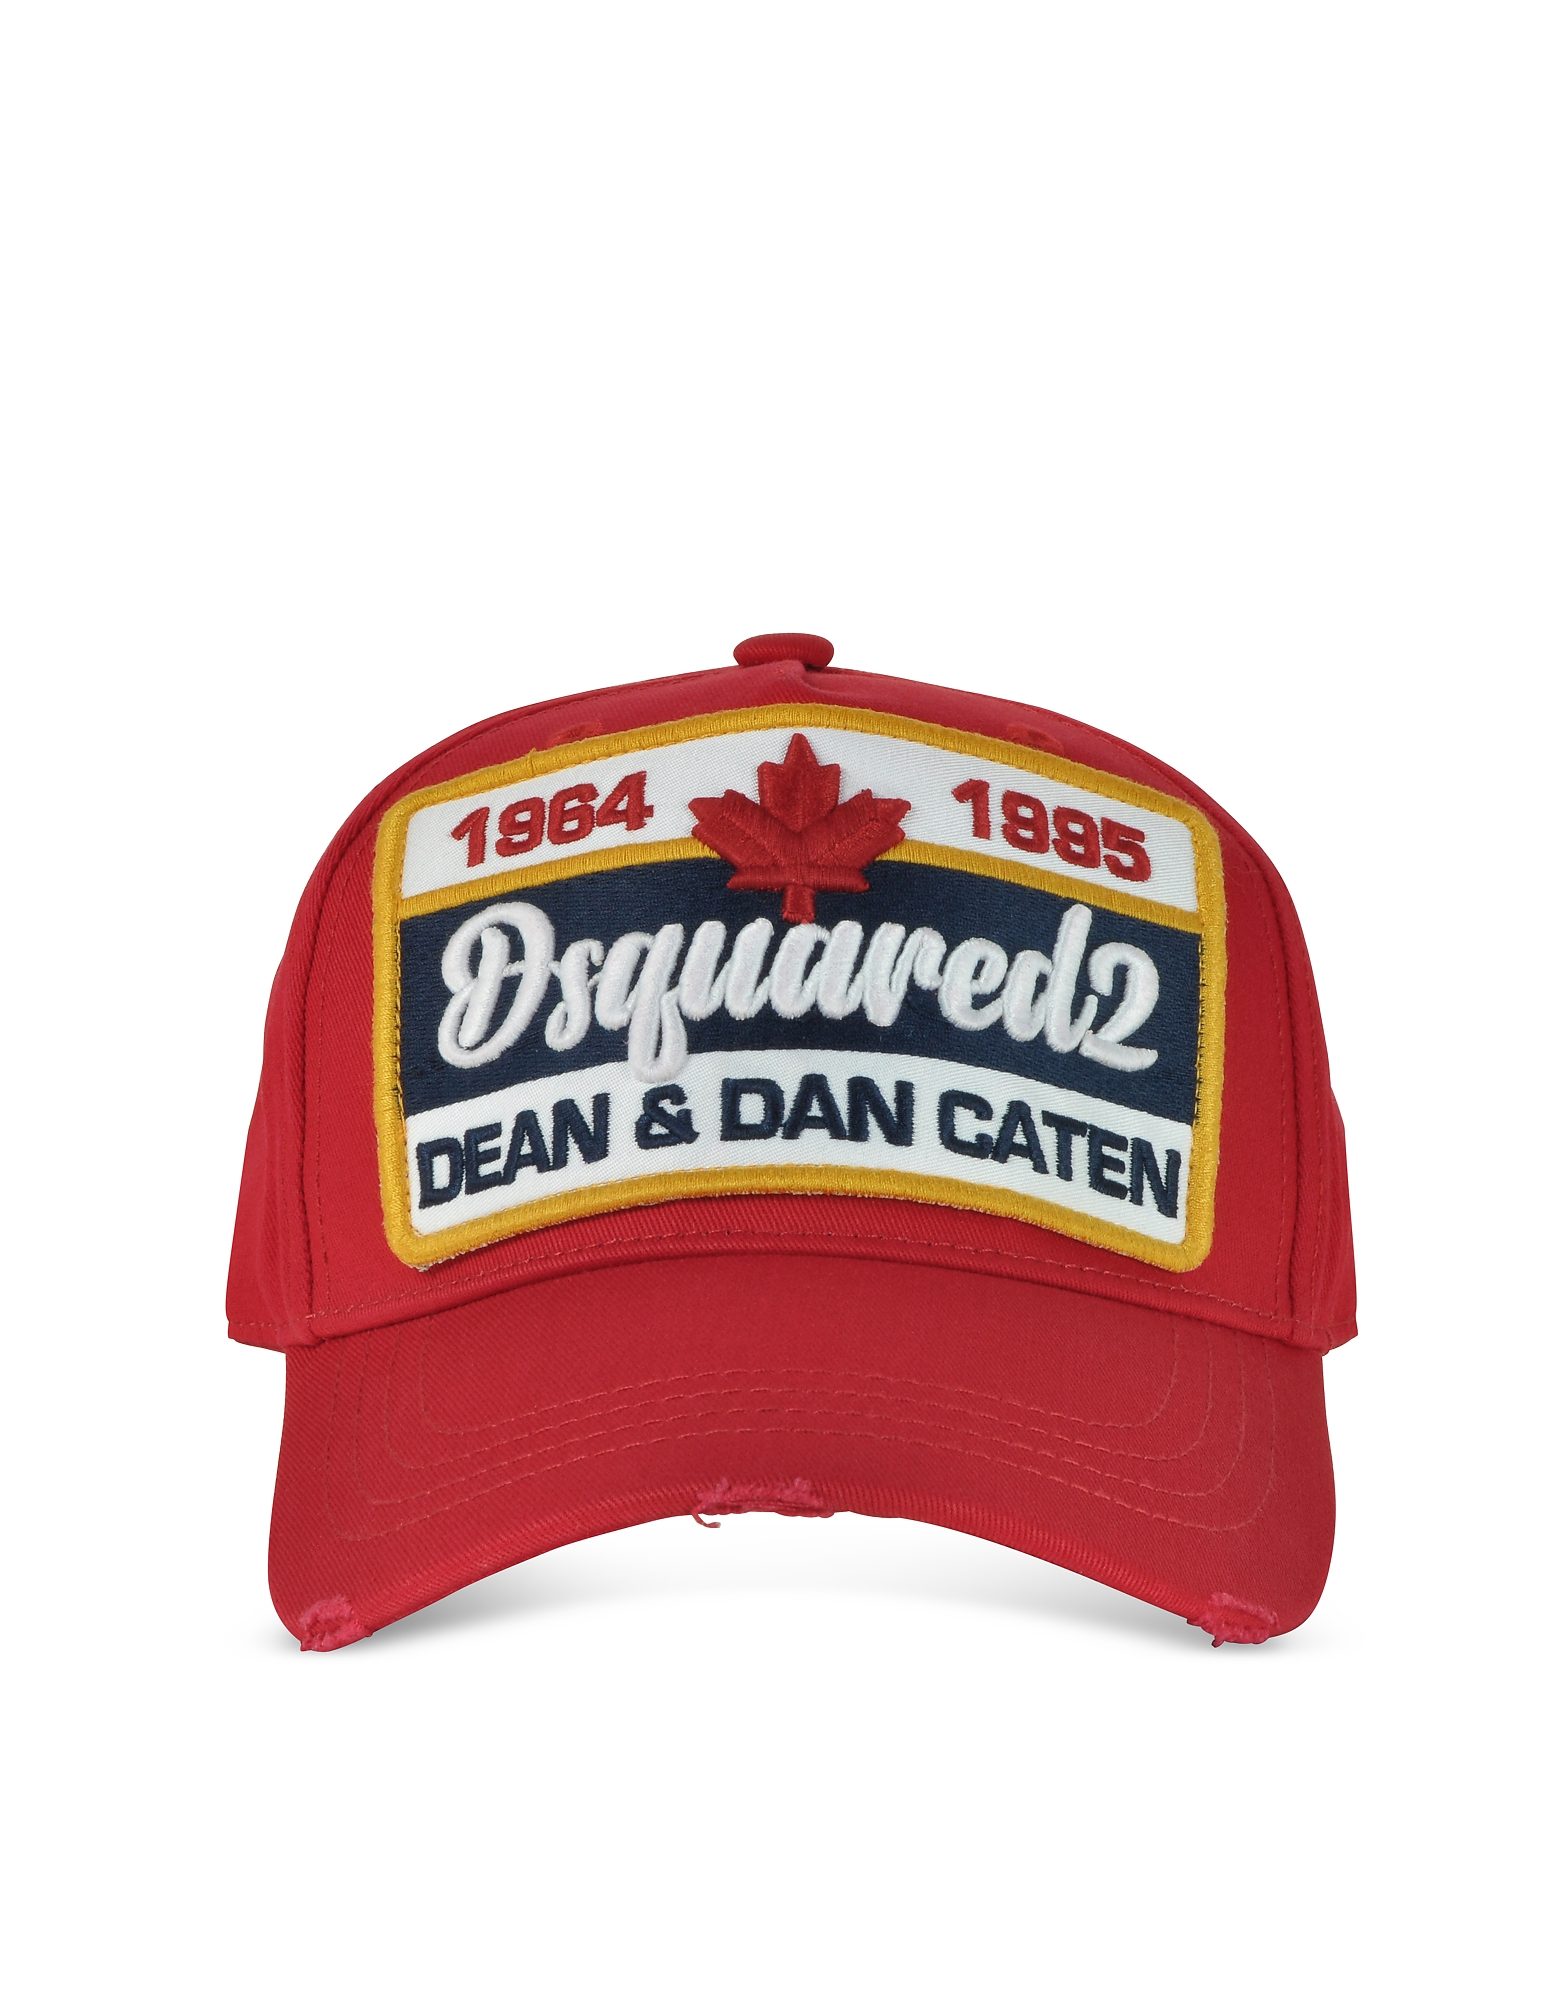 DSquared2 Men's Hats, Leaf Patch Logo Red Gabardine Baseball Cap